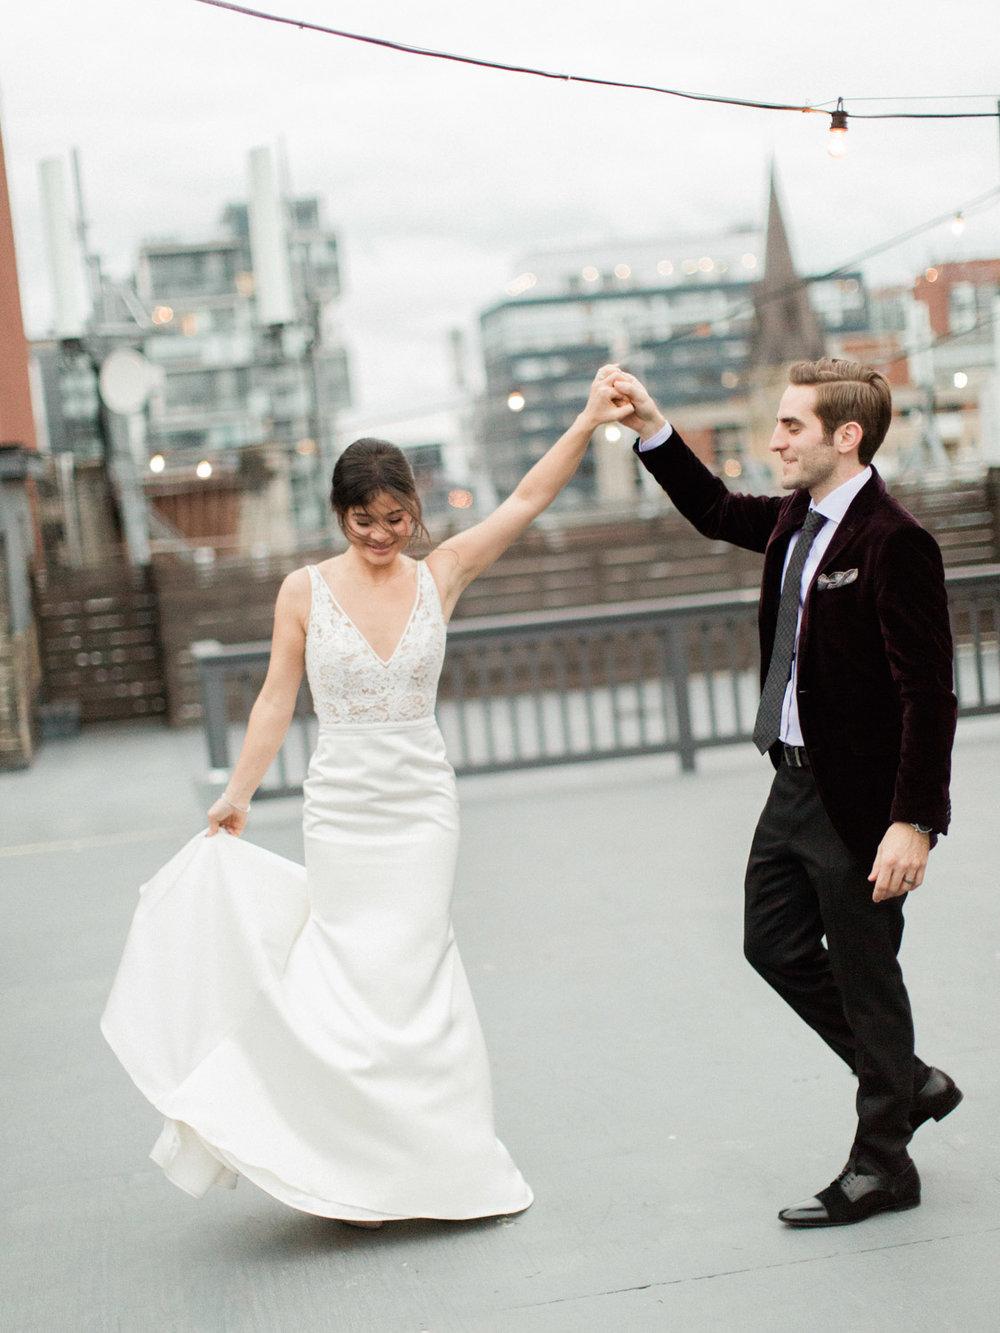 Toronto-wedding-photographer-intimate-italian-the-burroughes-downtown125.jpg